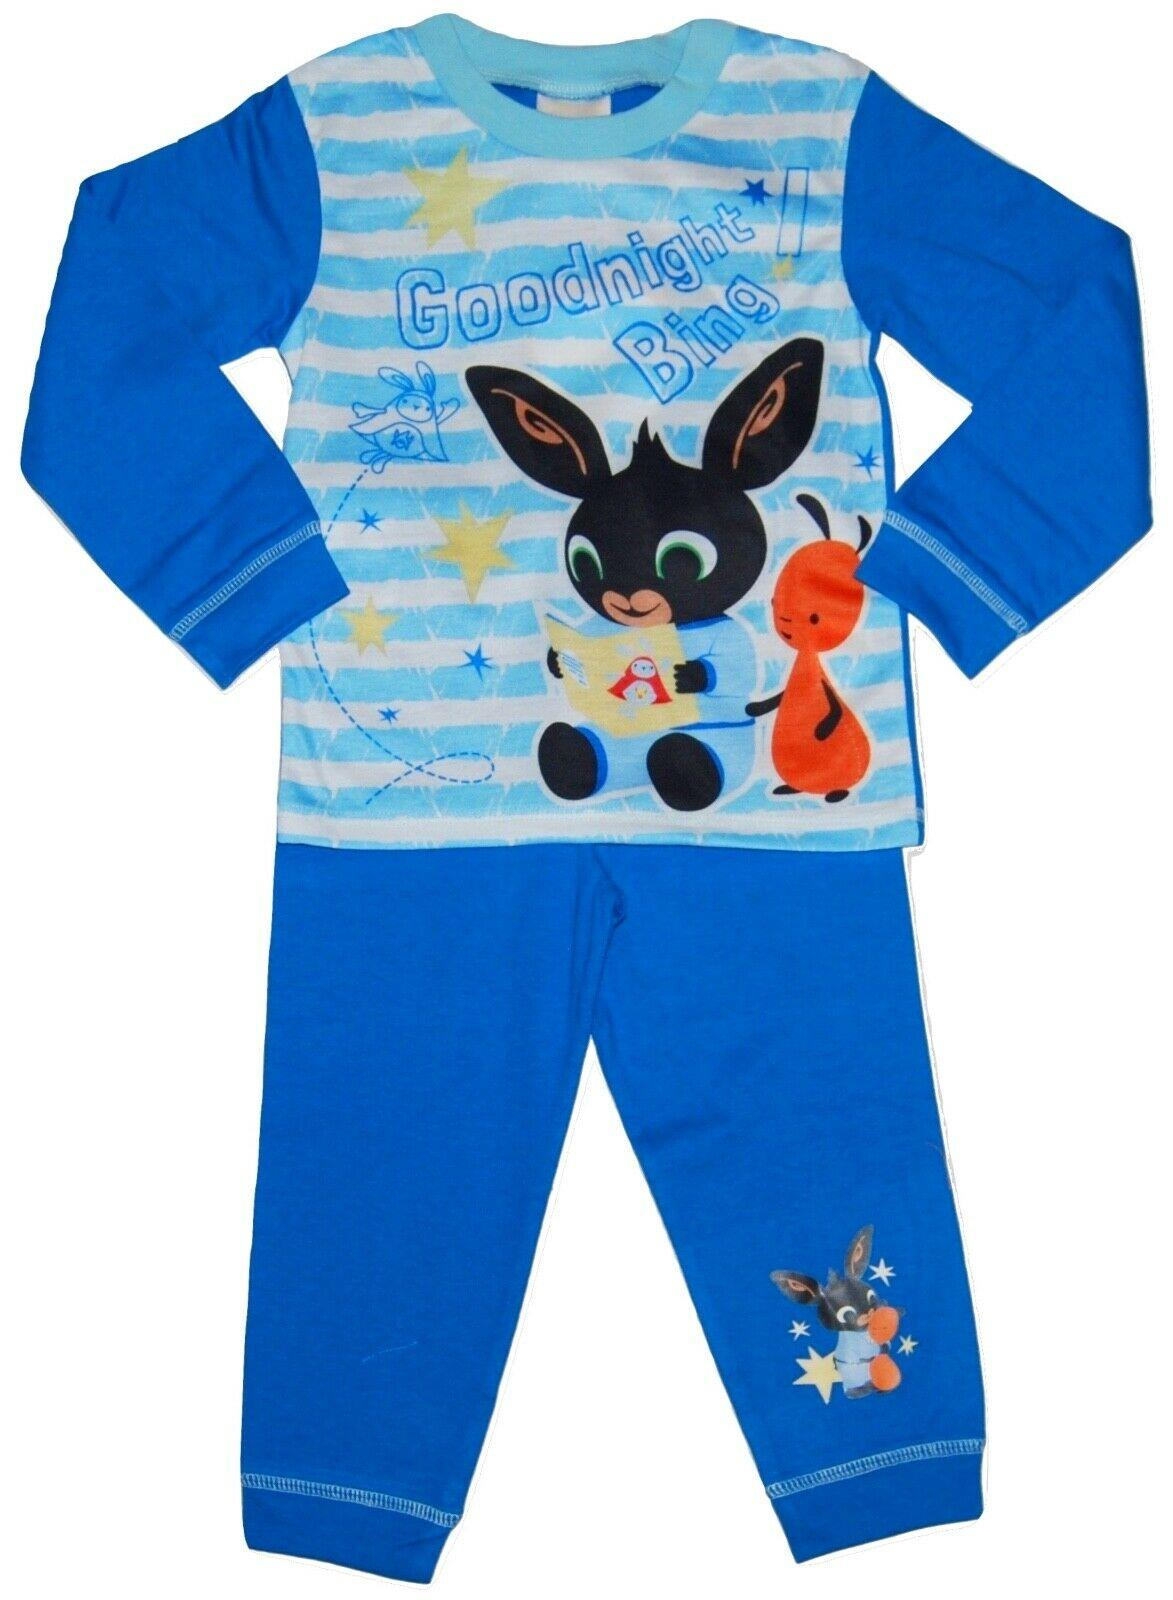 Toddler Bing Pjs CBeebies Goodnight Blue Boys Pyjamas Character